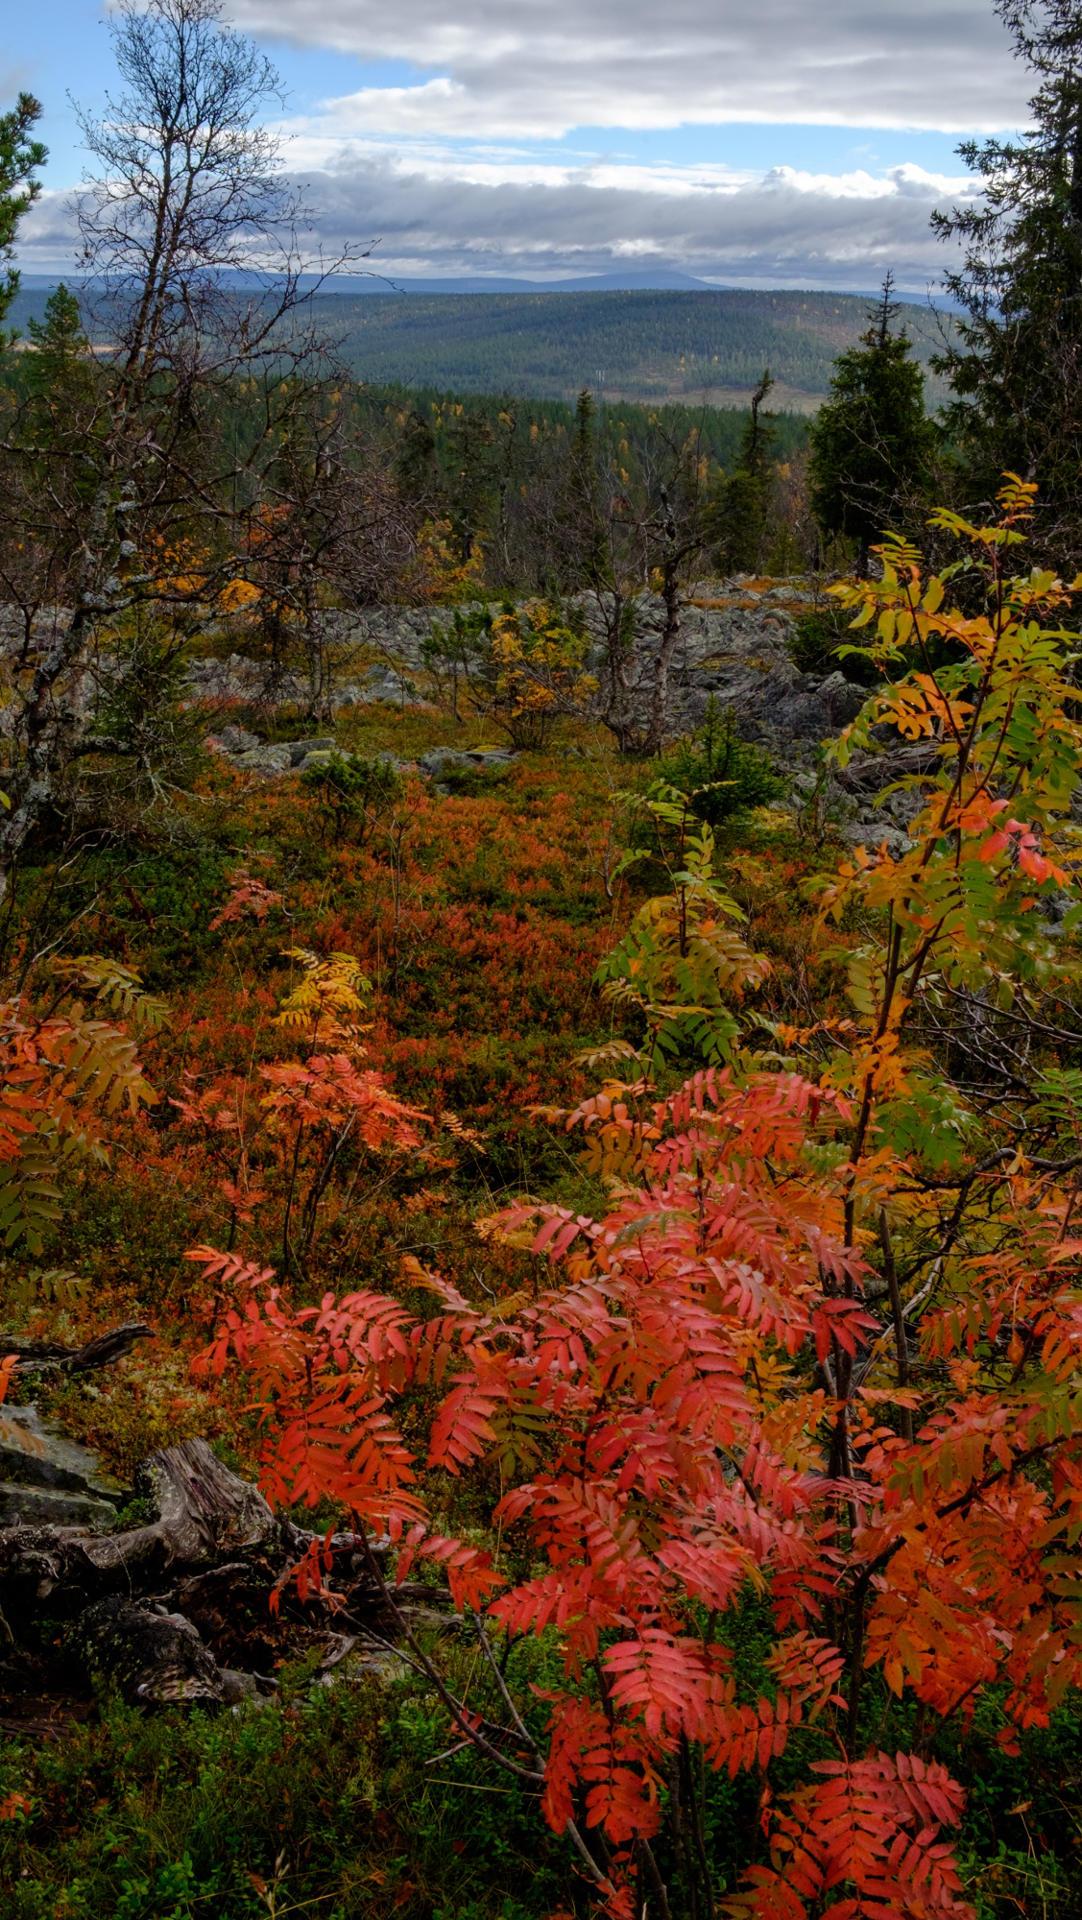 Valley in Lapland during autumn